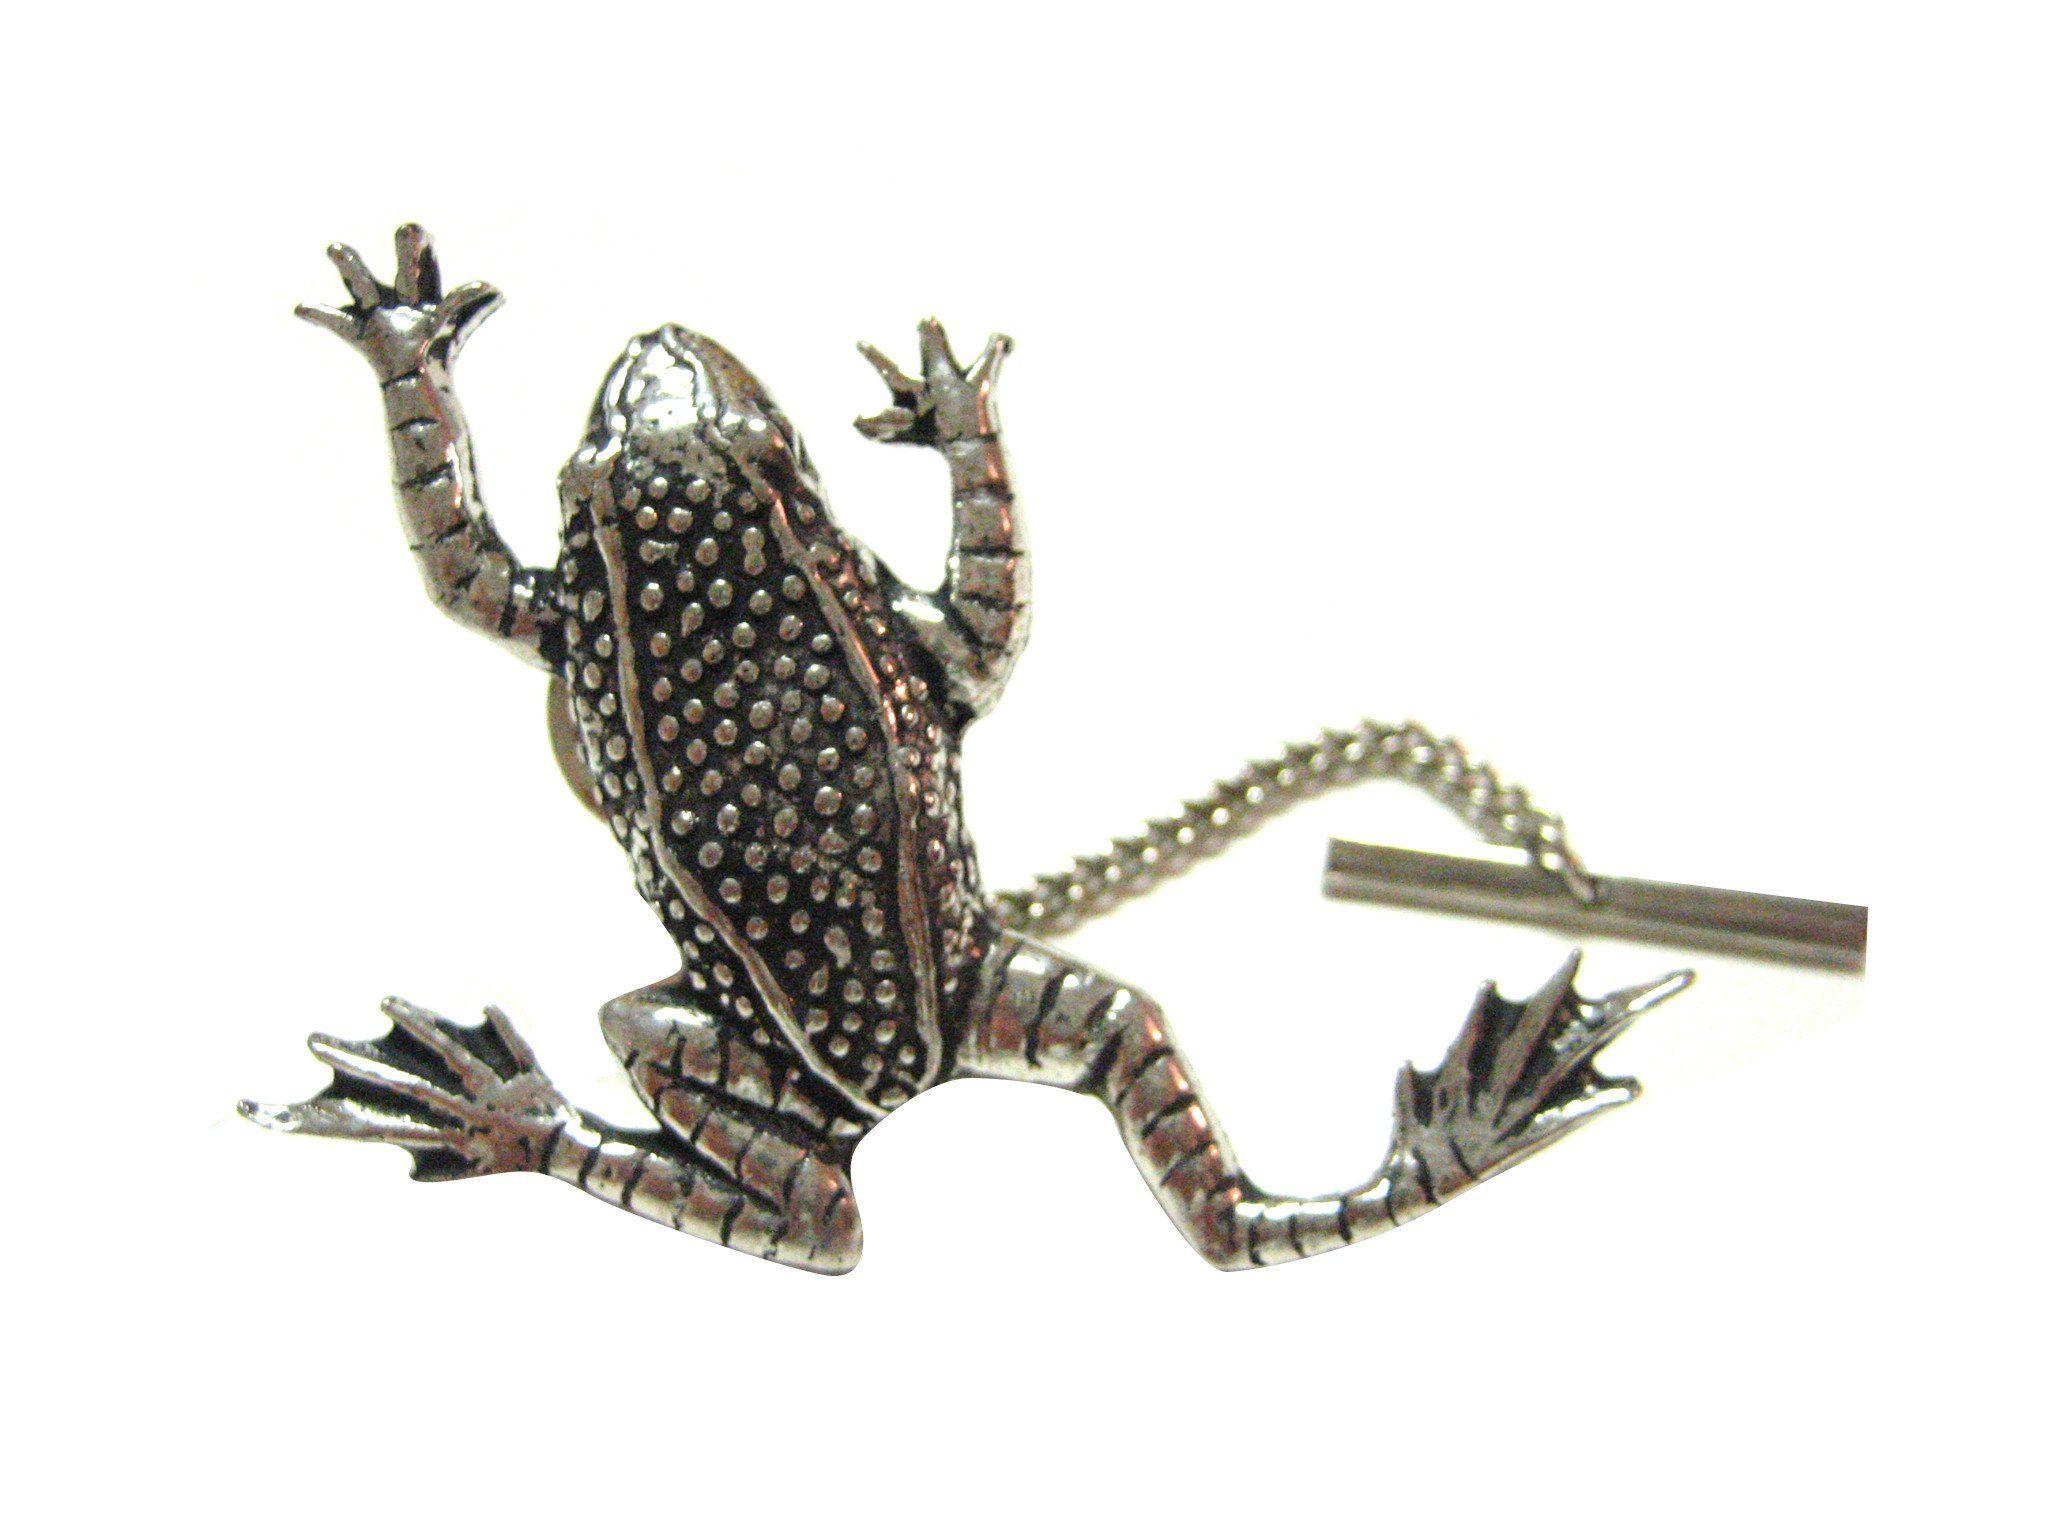 Frog Toad Tie Tack